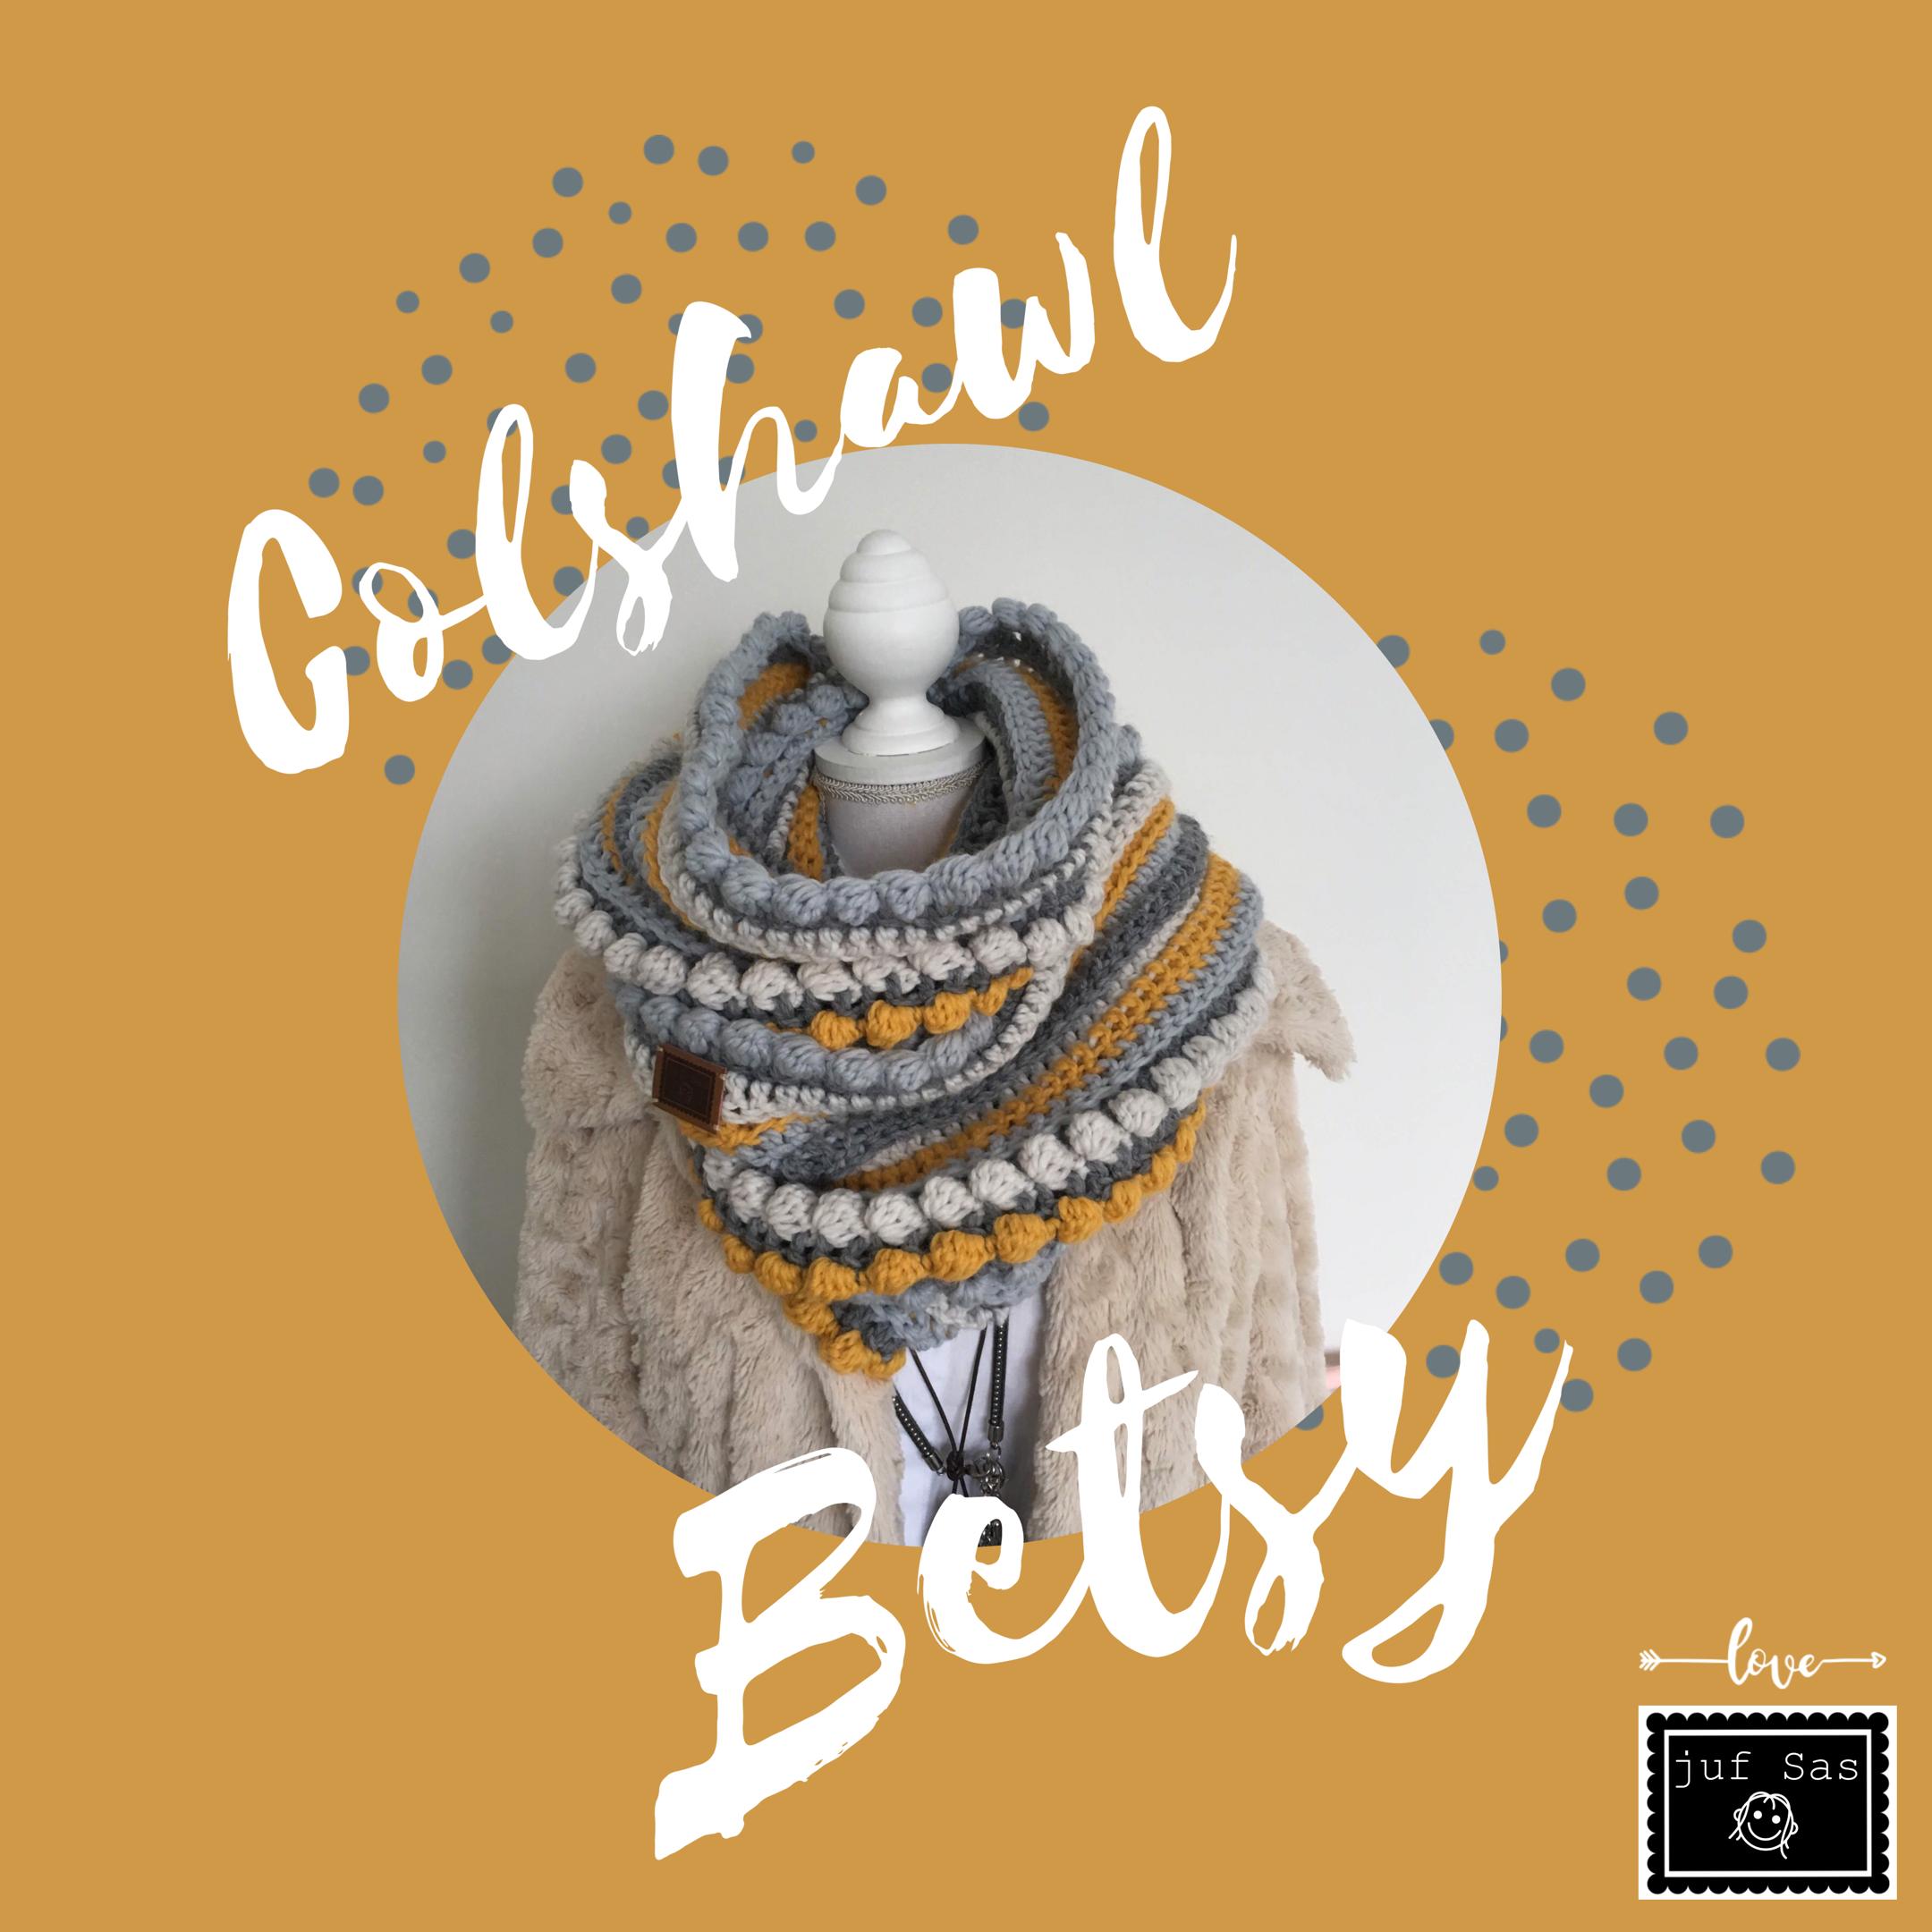 Colshawl Betsy